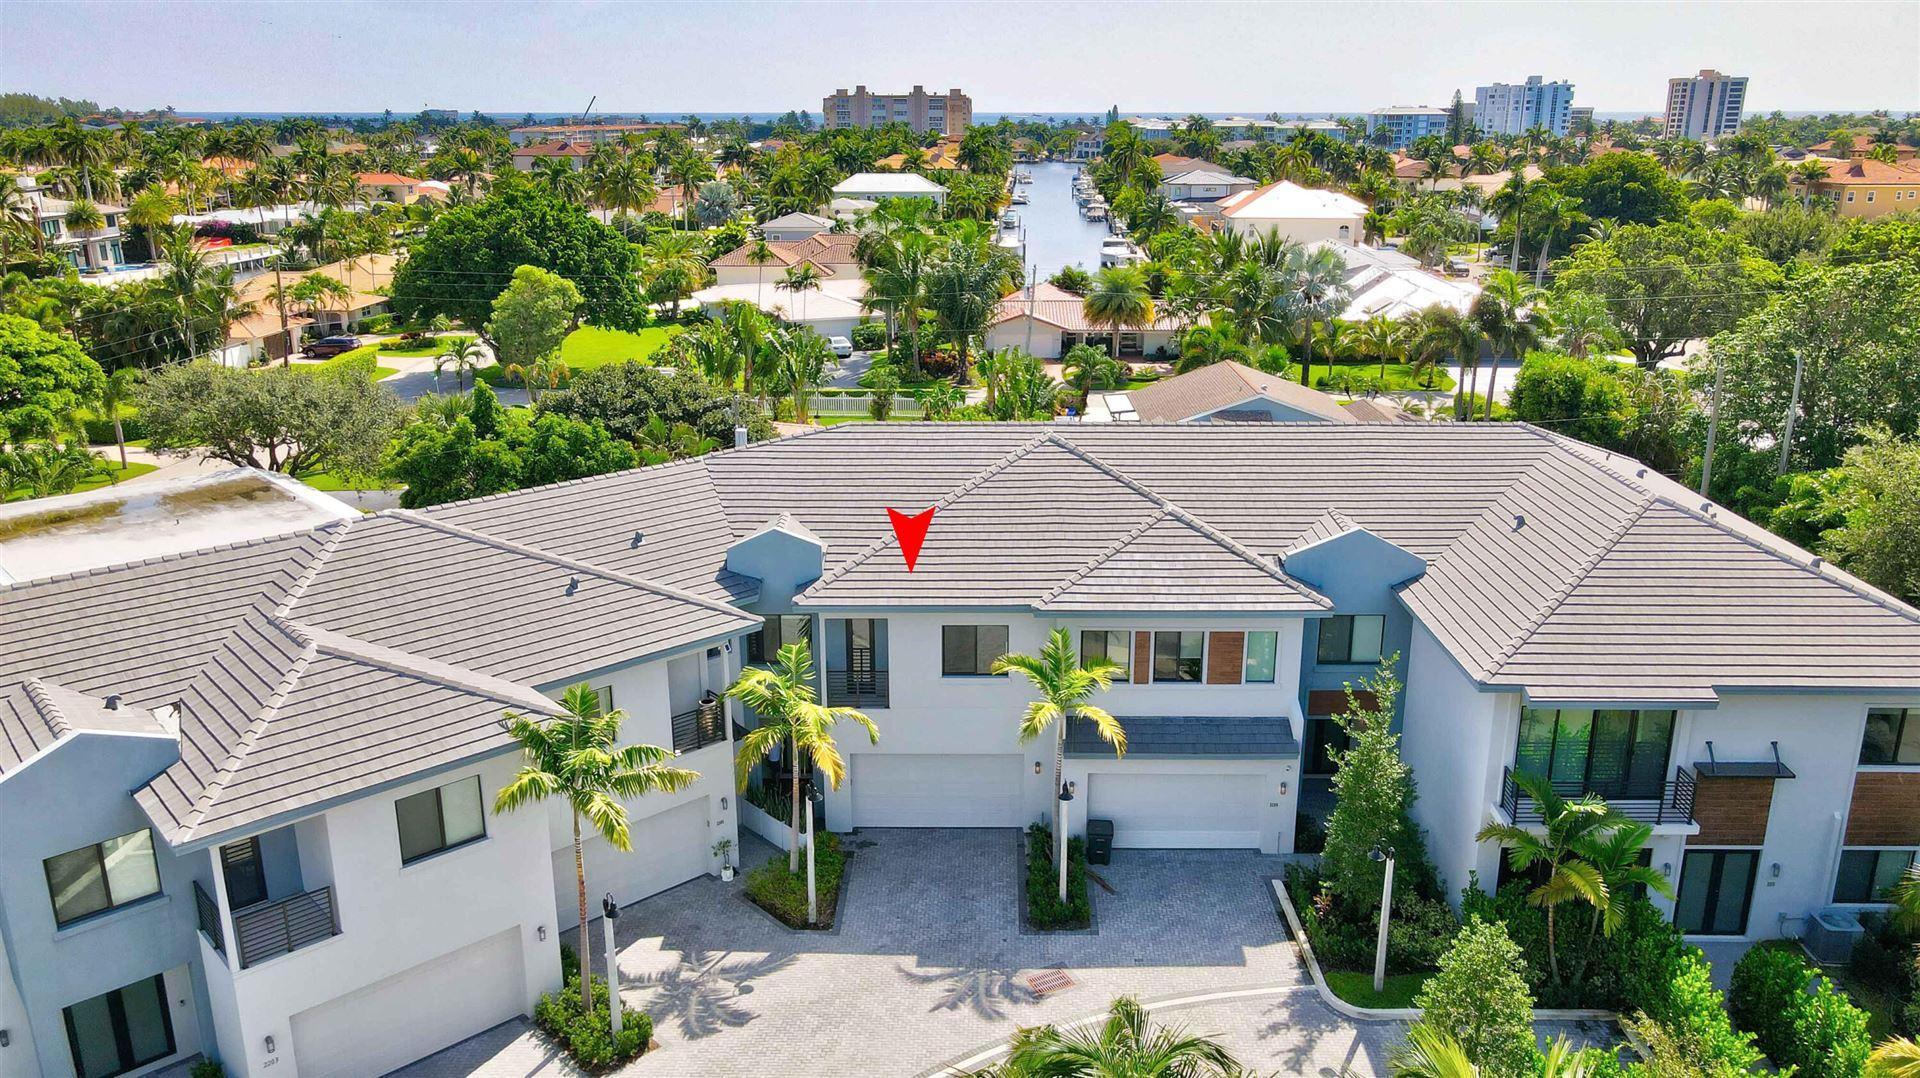 2207 Florida Blvd, Delray Beach, FL 33483 - #: RX-10744556